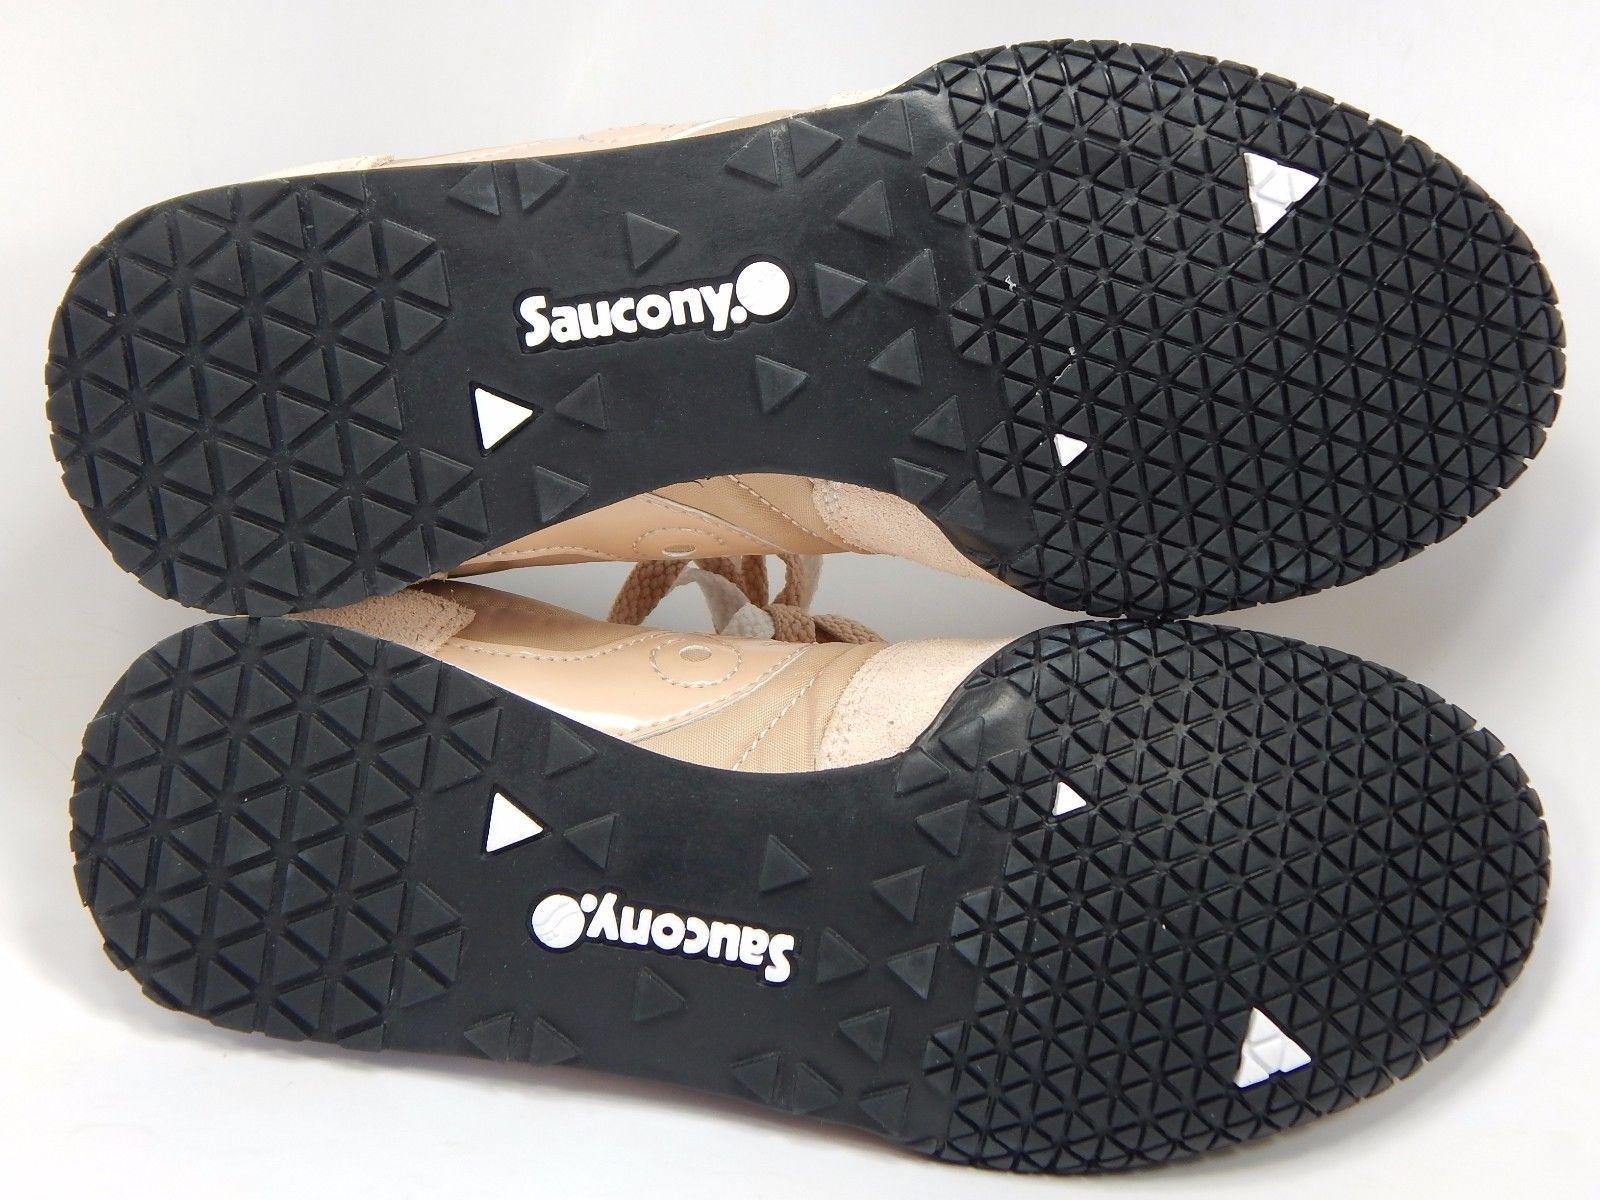 Saucony Original Bullet Women's Running Shoes Size 7 M (B) EU 38 Tan S1943-165